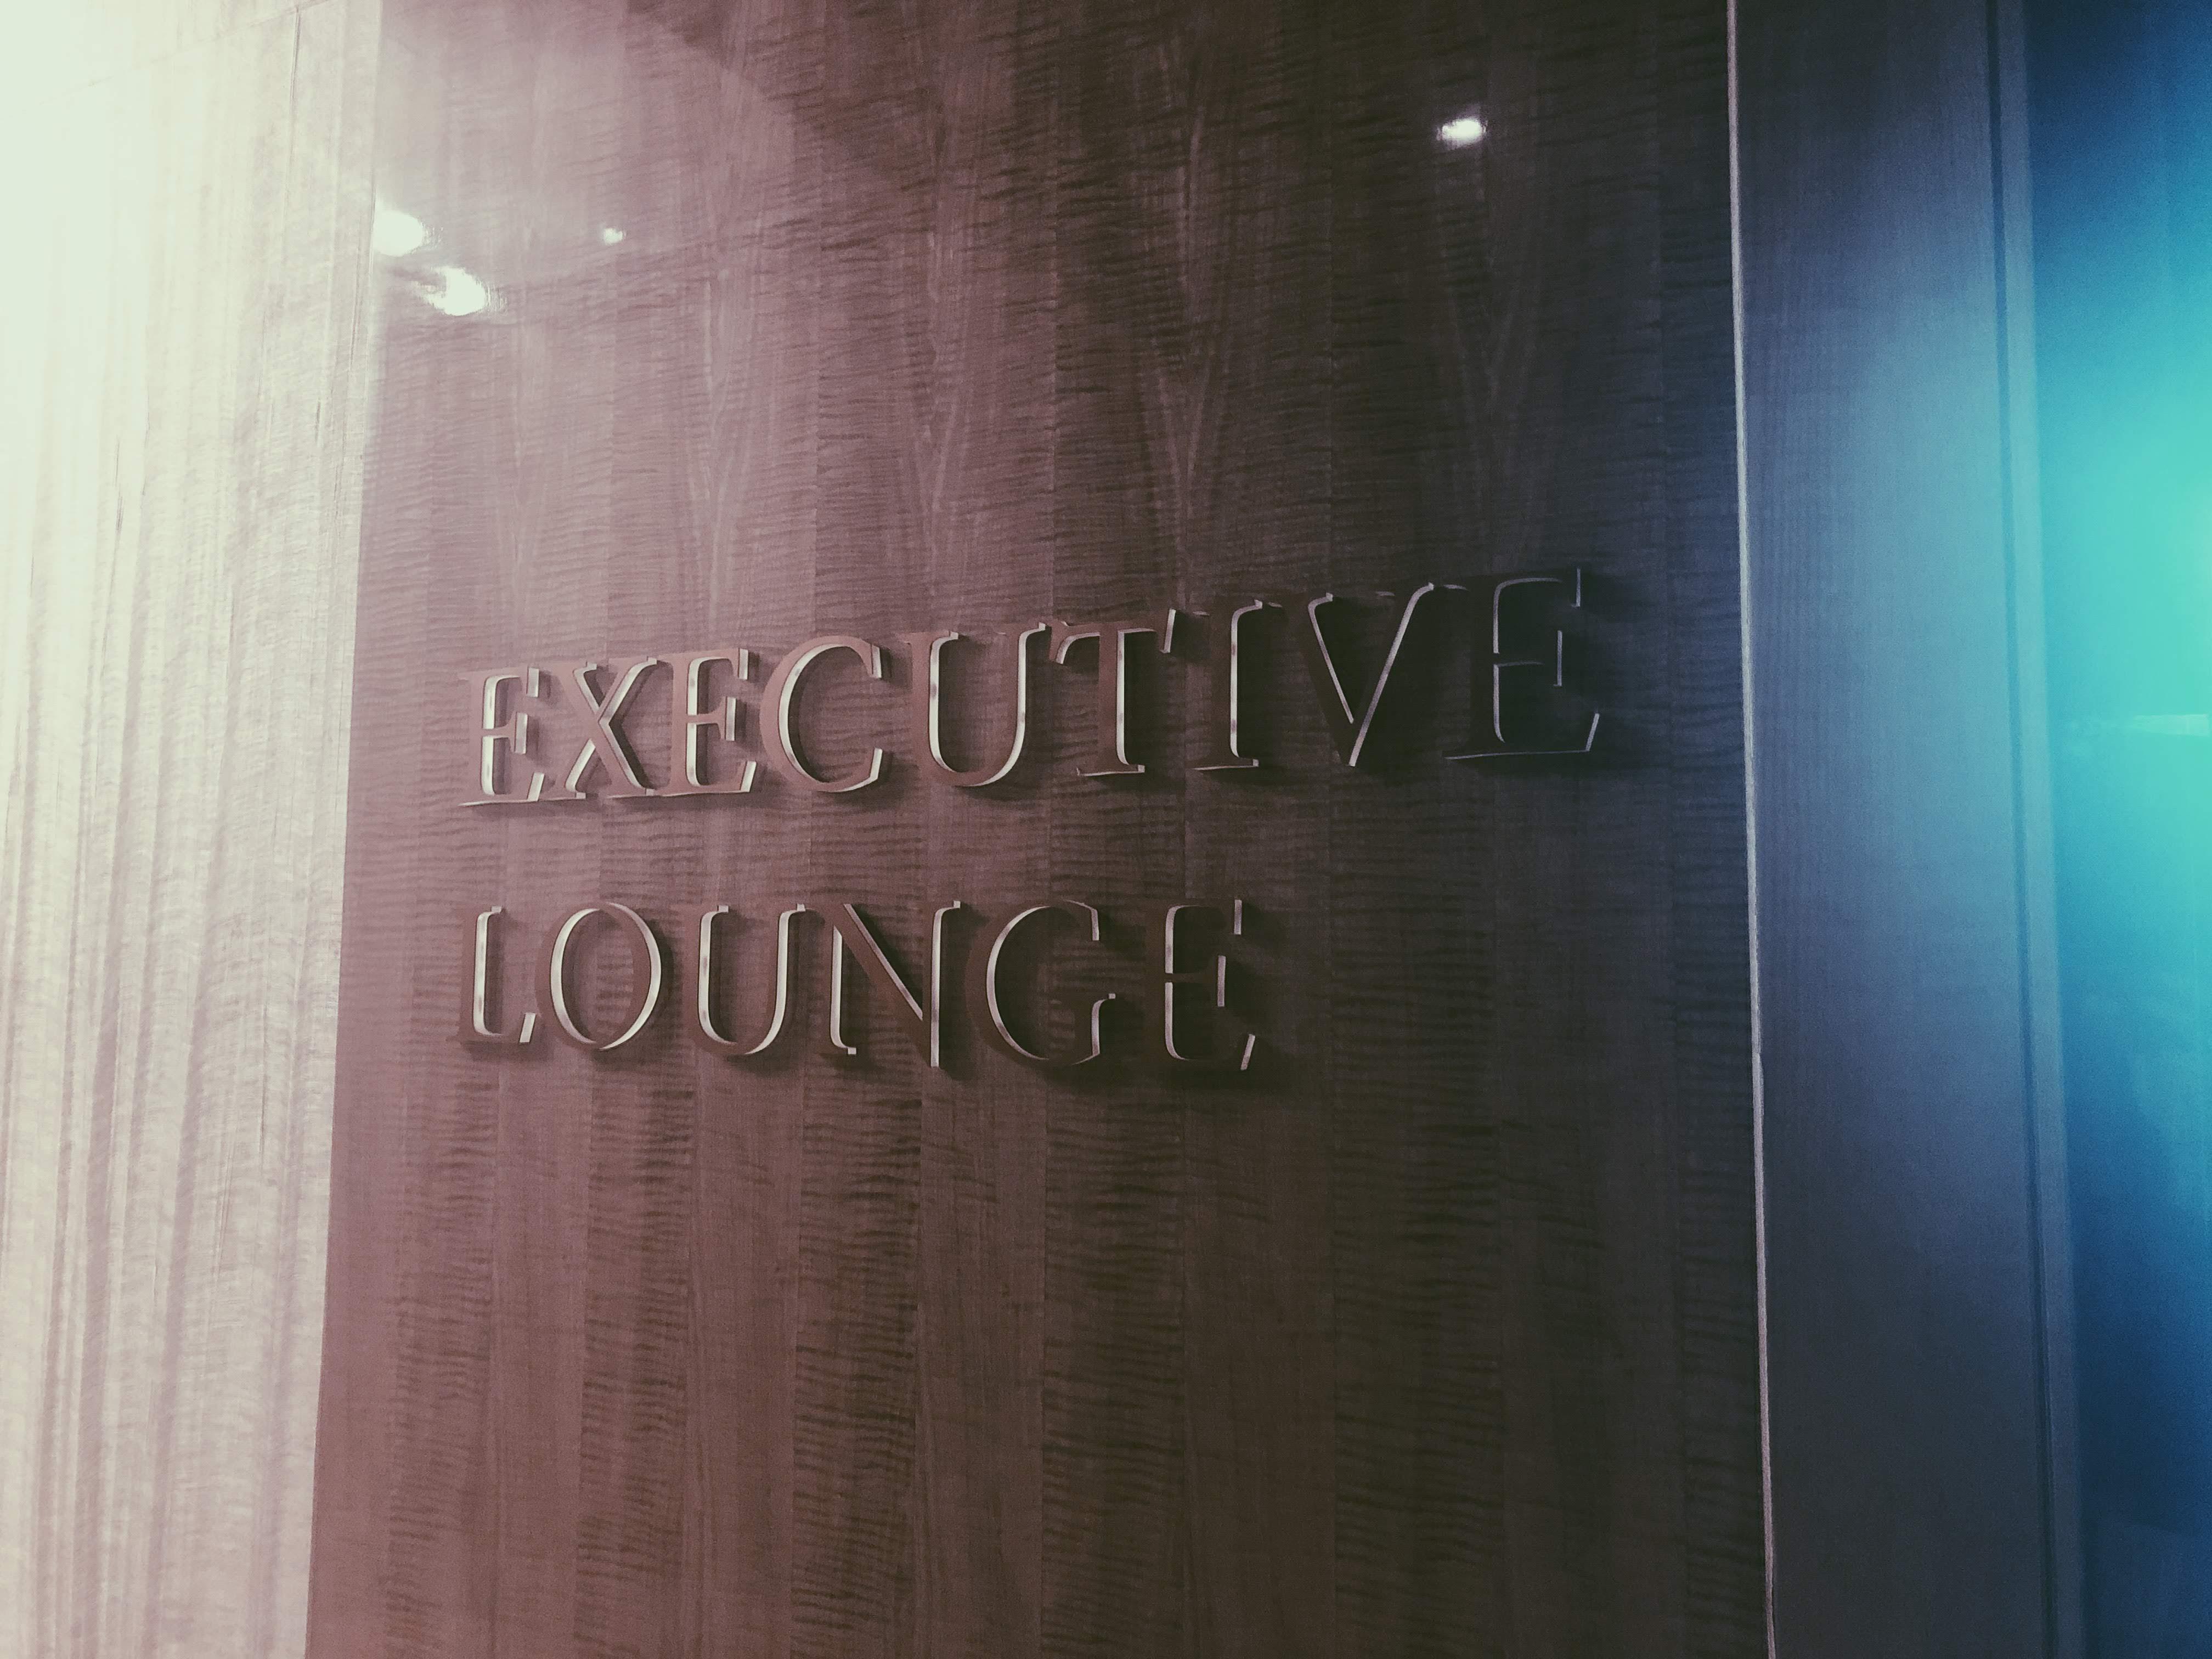 "Malaysia_FSKL_ExecutiveLounge_004"""""